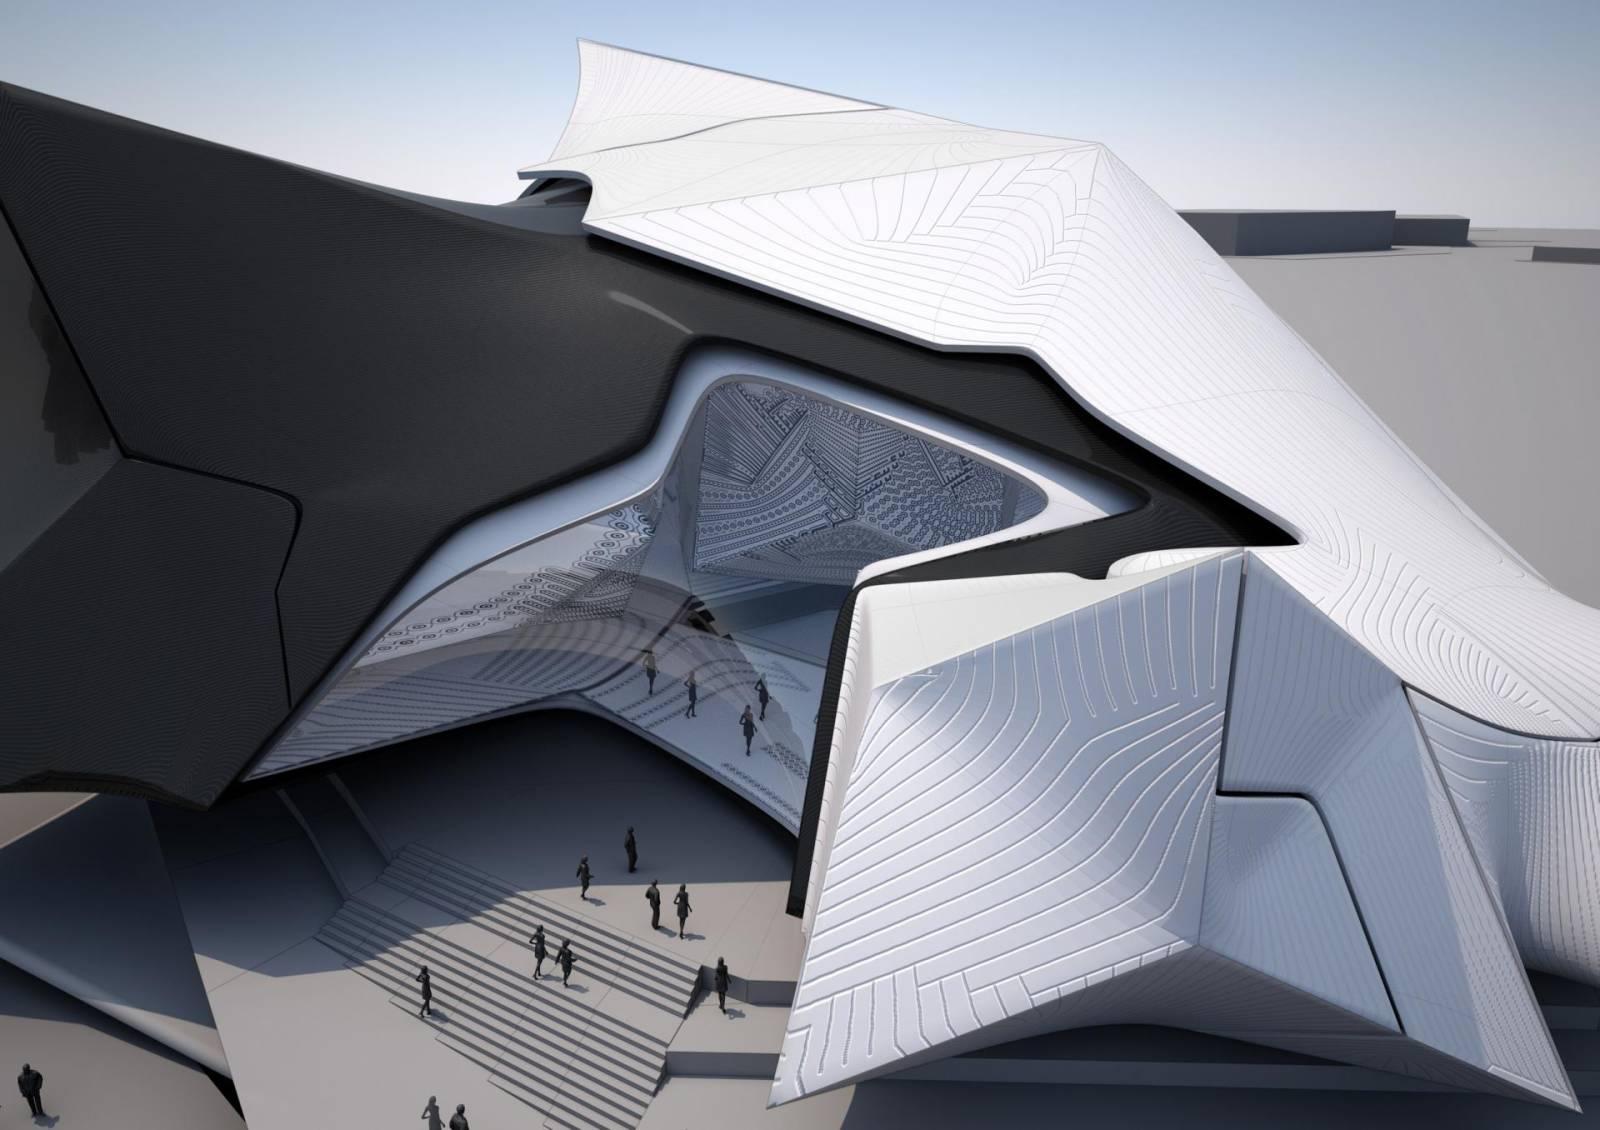 Collider Activity Center By Tom Wiscombe Design